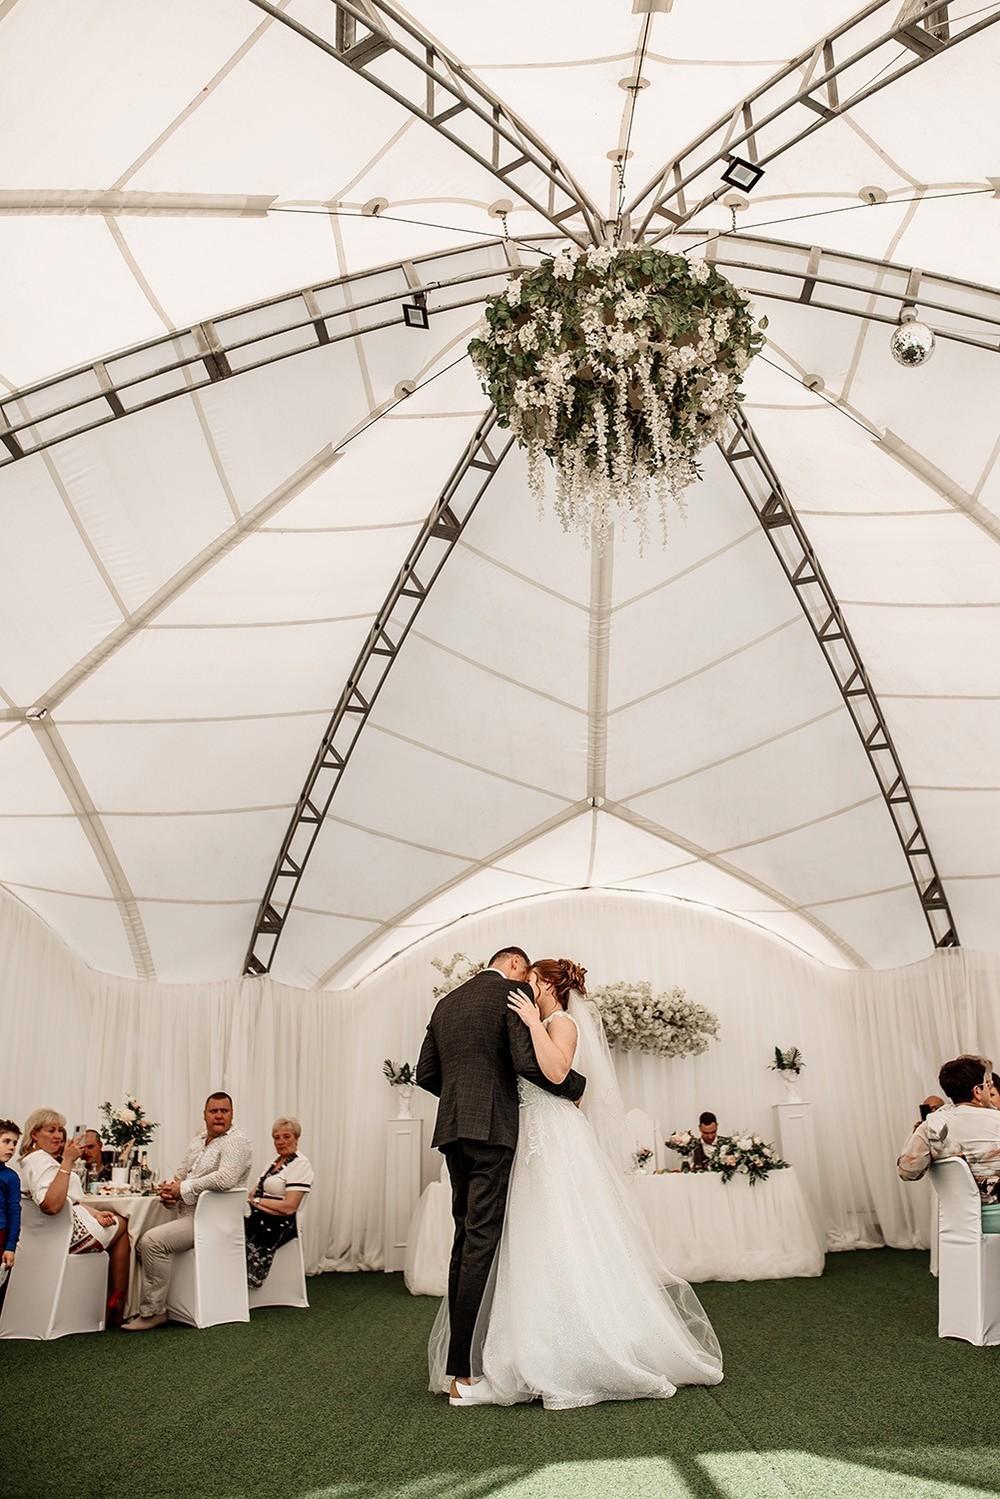 Свадебная фотосъемка и лав стори - 12 июня 2021